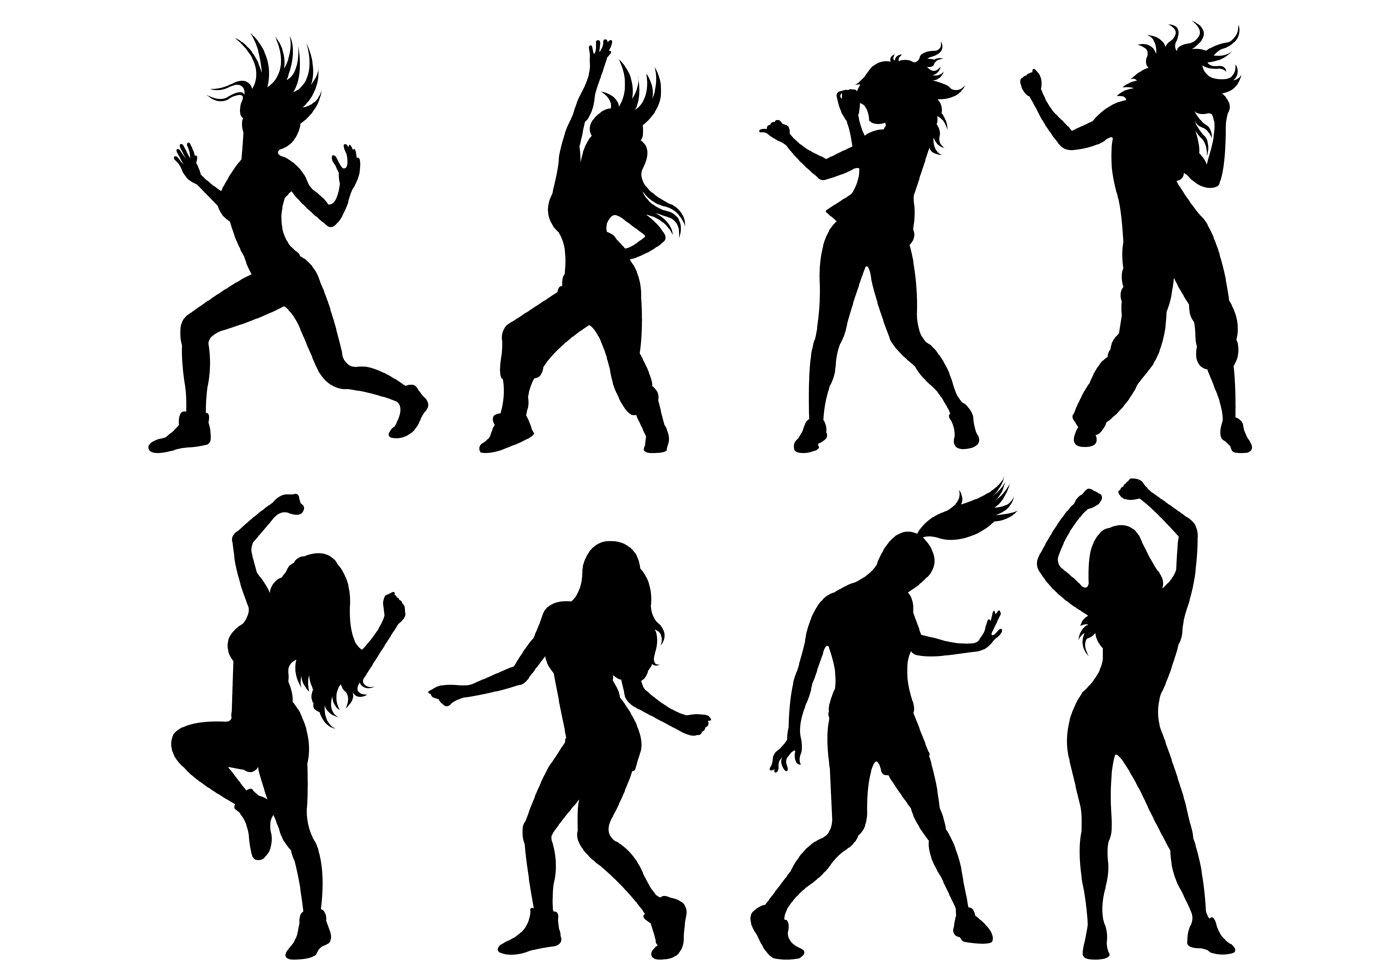 Clip Art of Zumba | zumba clip art image search results | Salud y  ejercicio, Ejercicios, Salud